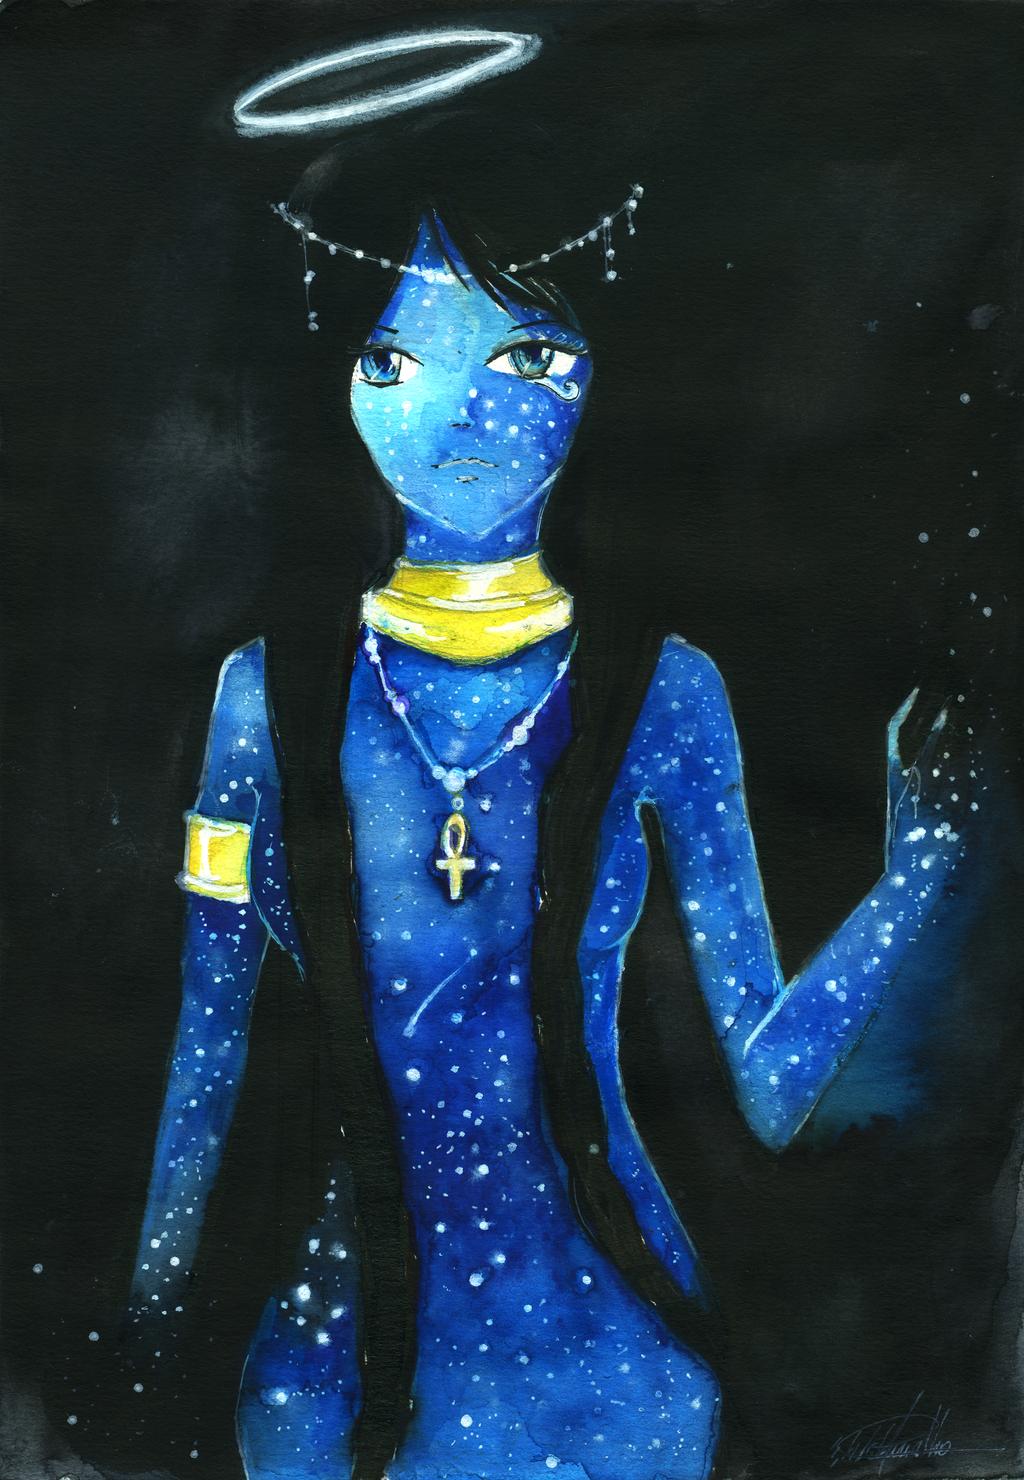 Nut, Egyptian Goddess of the Sky - 2276.8KB